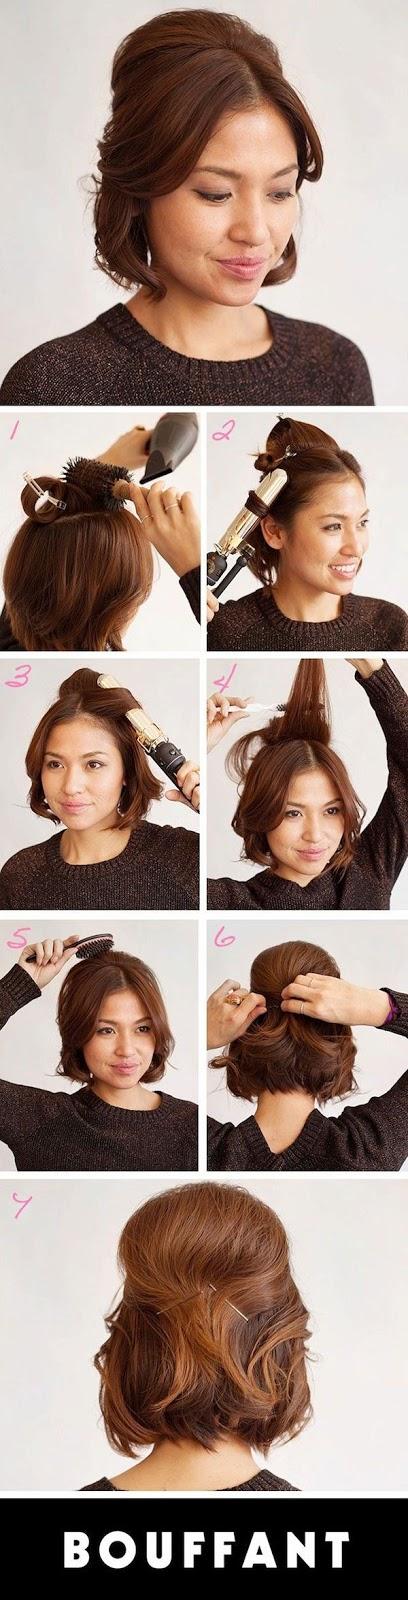 peinados fáciles para cabello corto   makillaje   pinterest